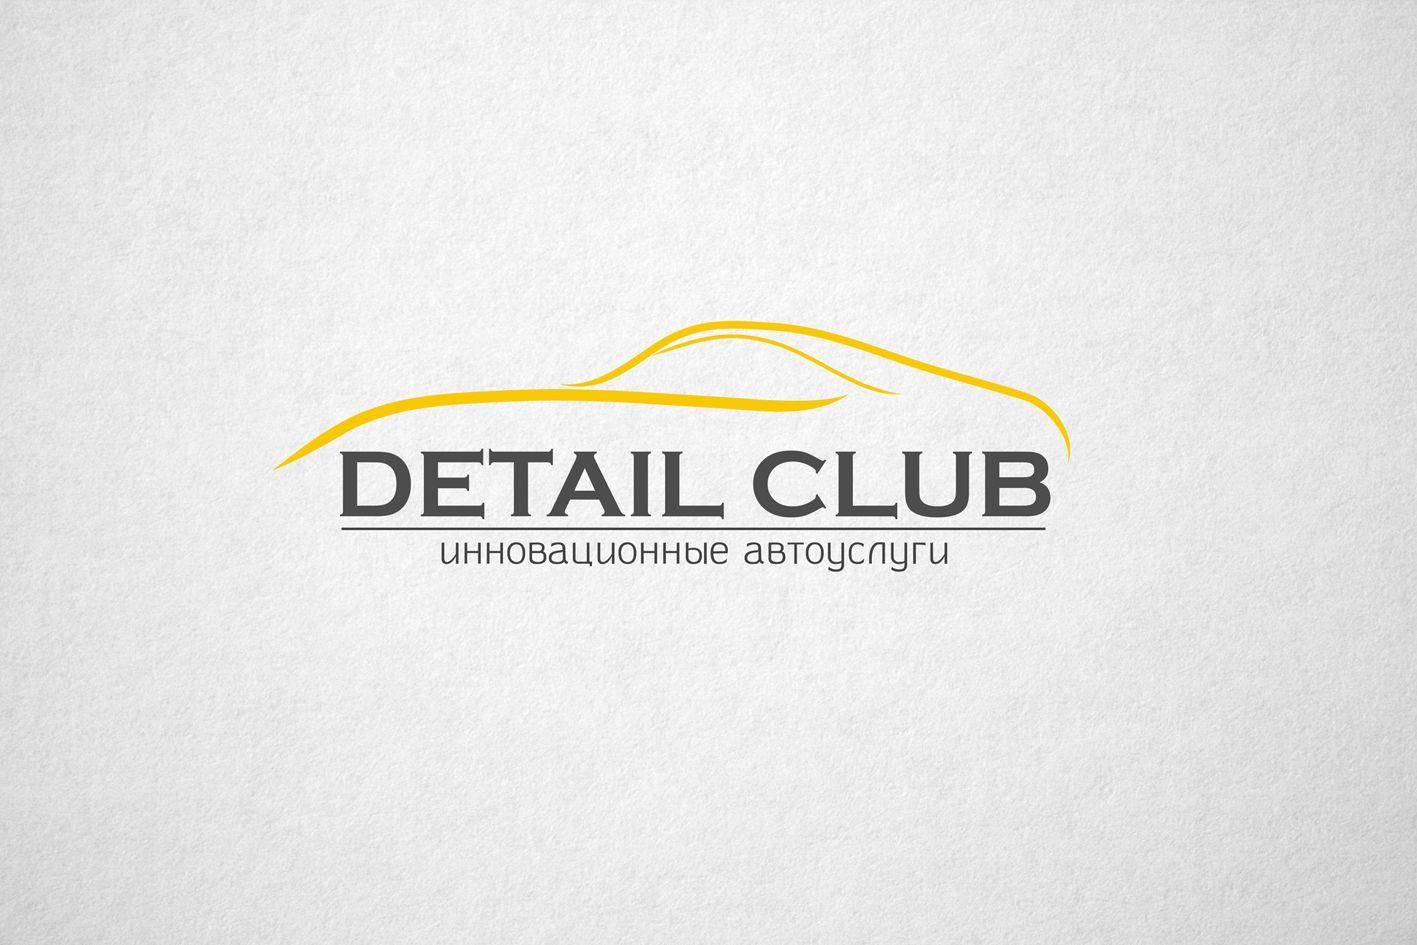 Логотип для компании (детейлинг студия) - дизайнер funkielevis